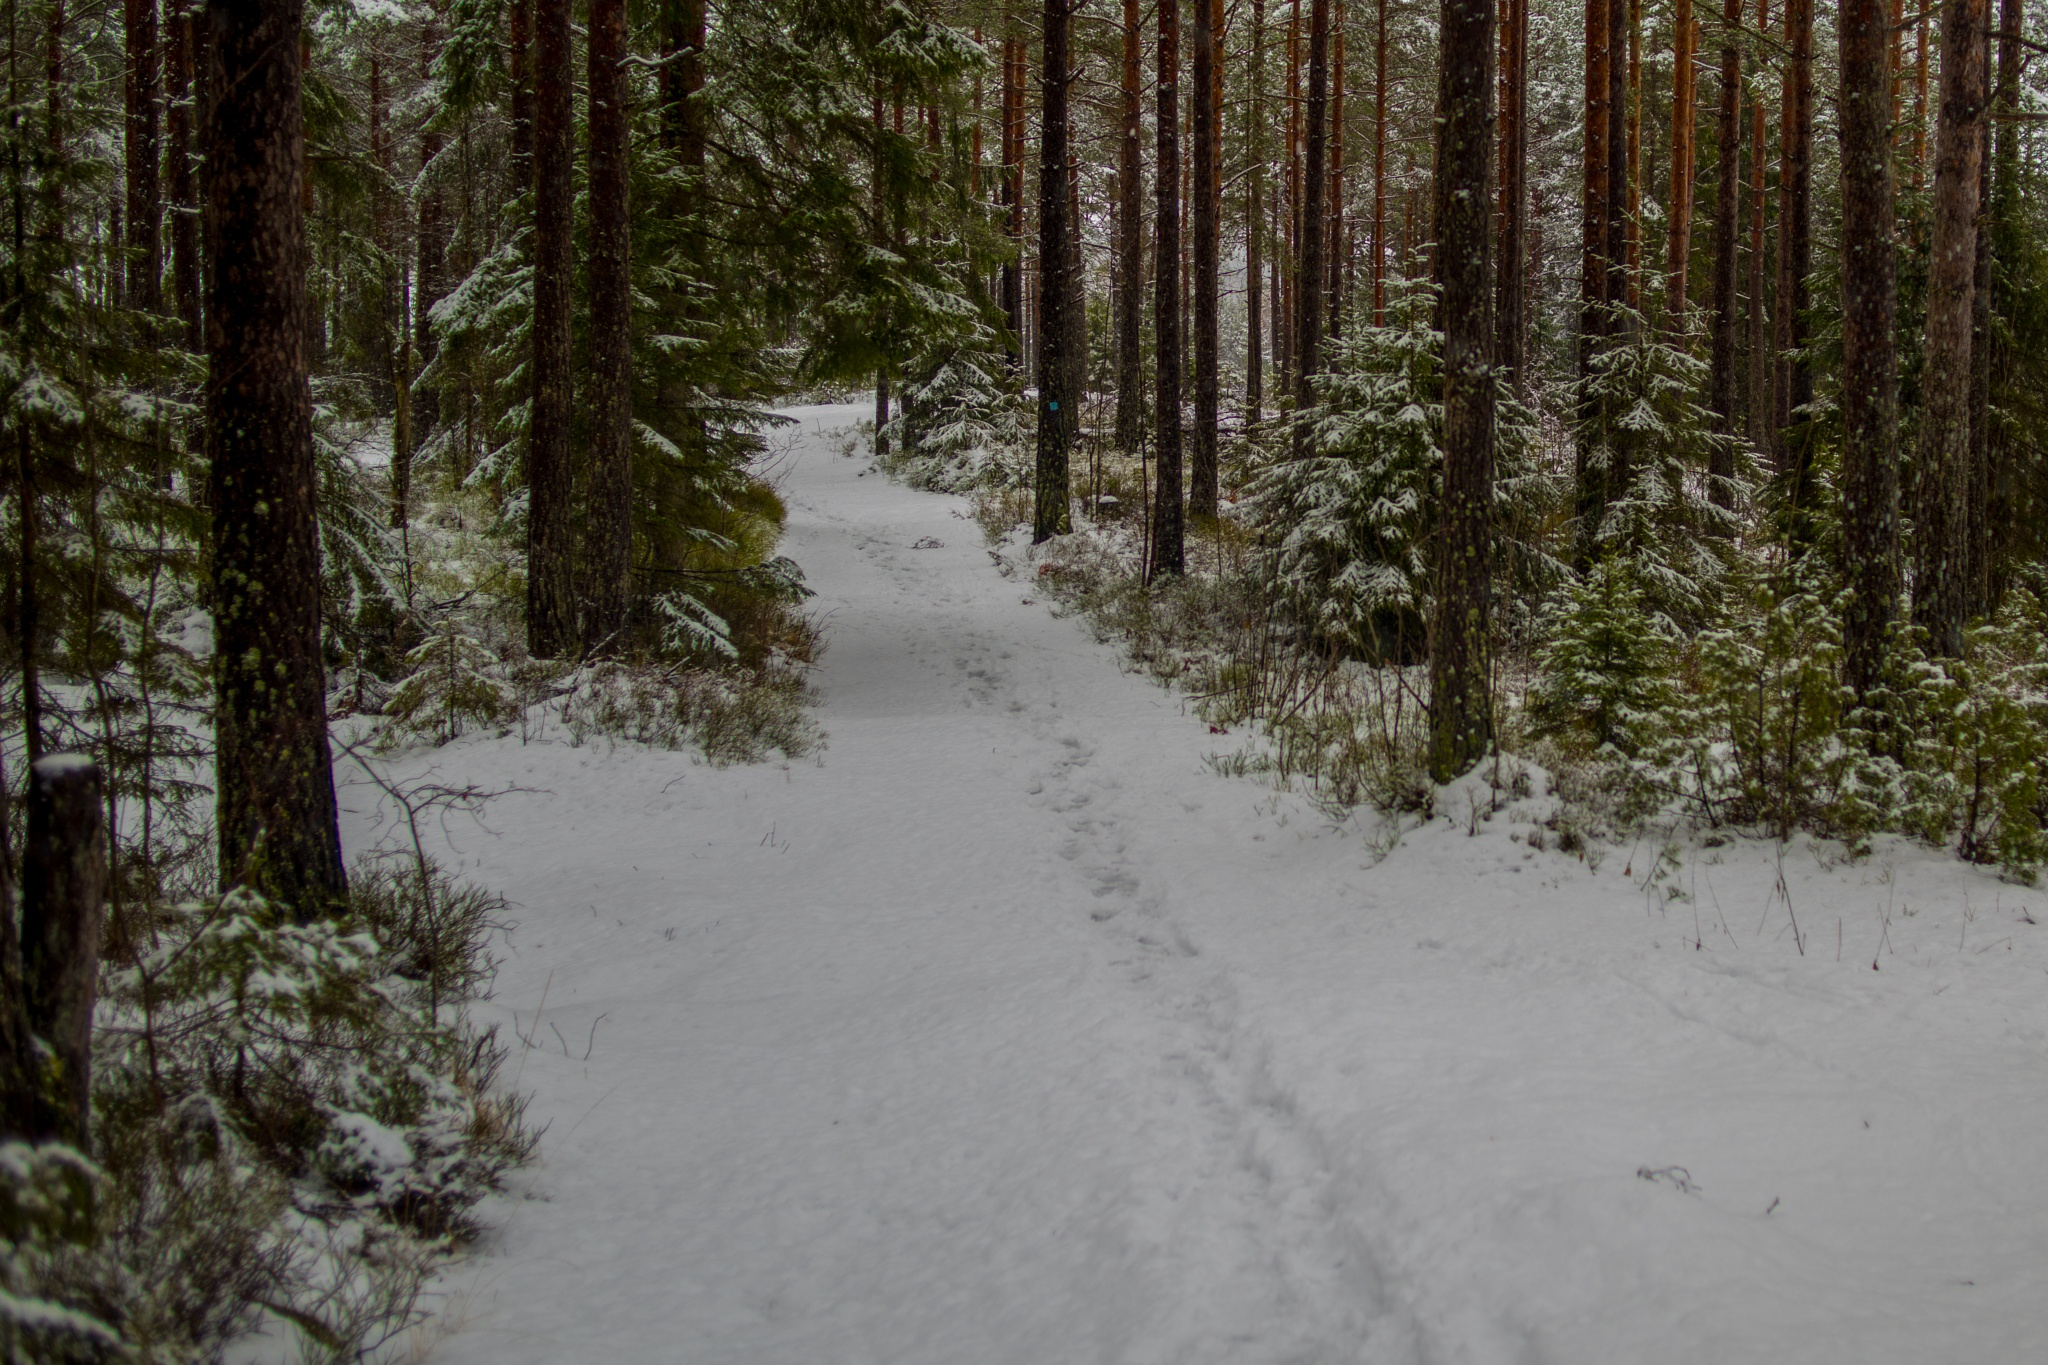 Crossroad by Ole Morten Eyra